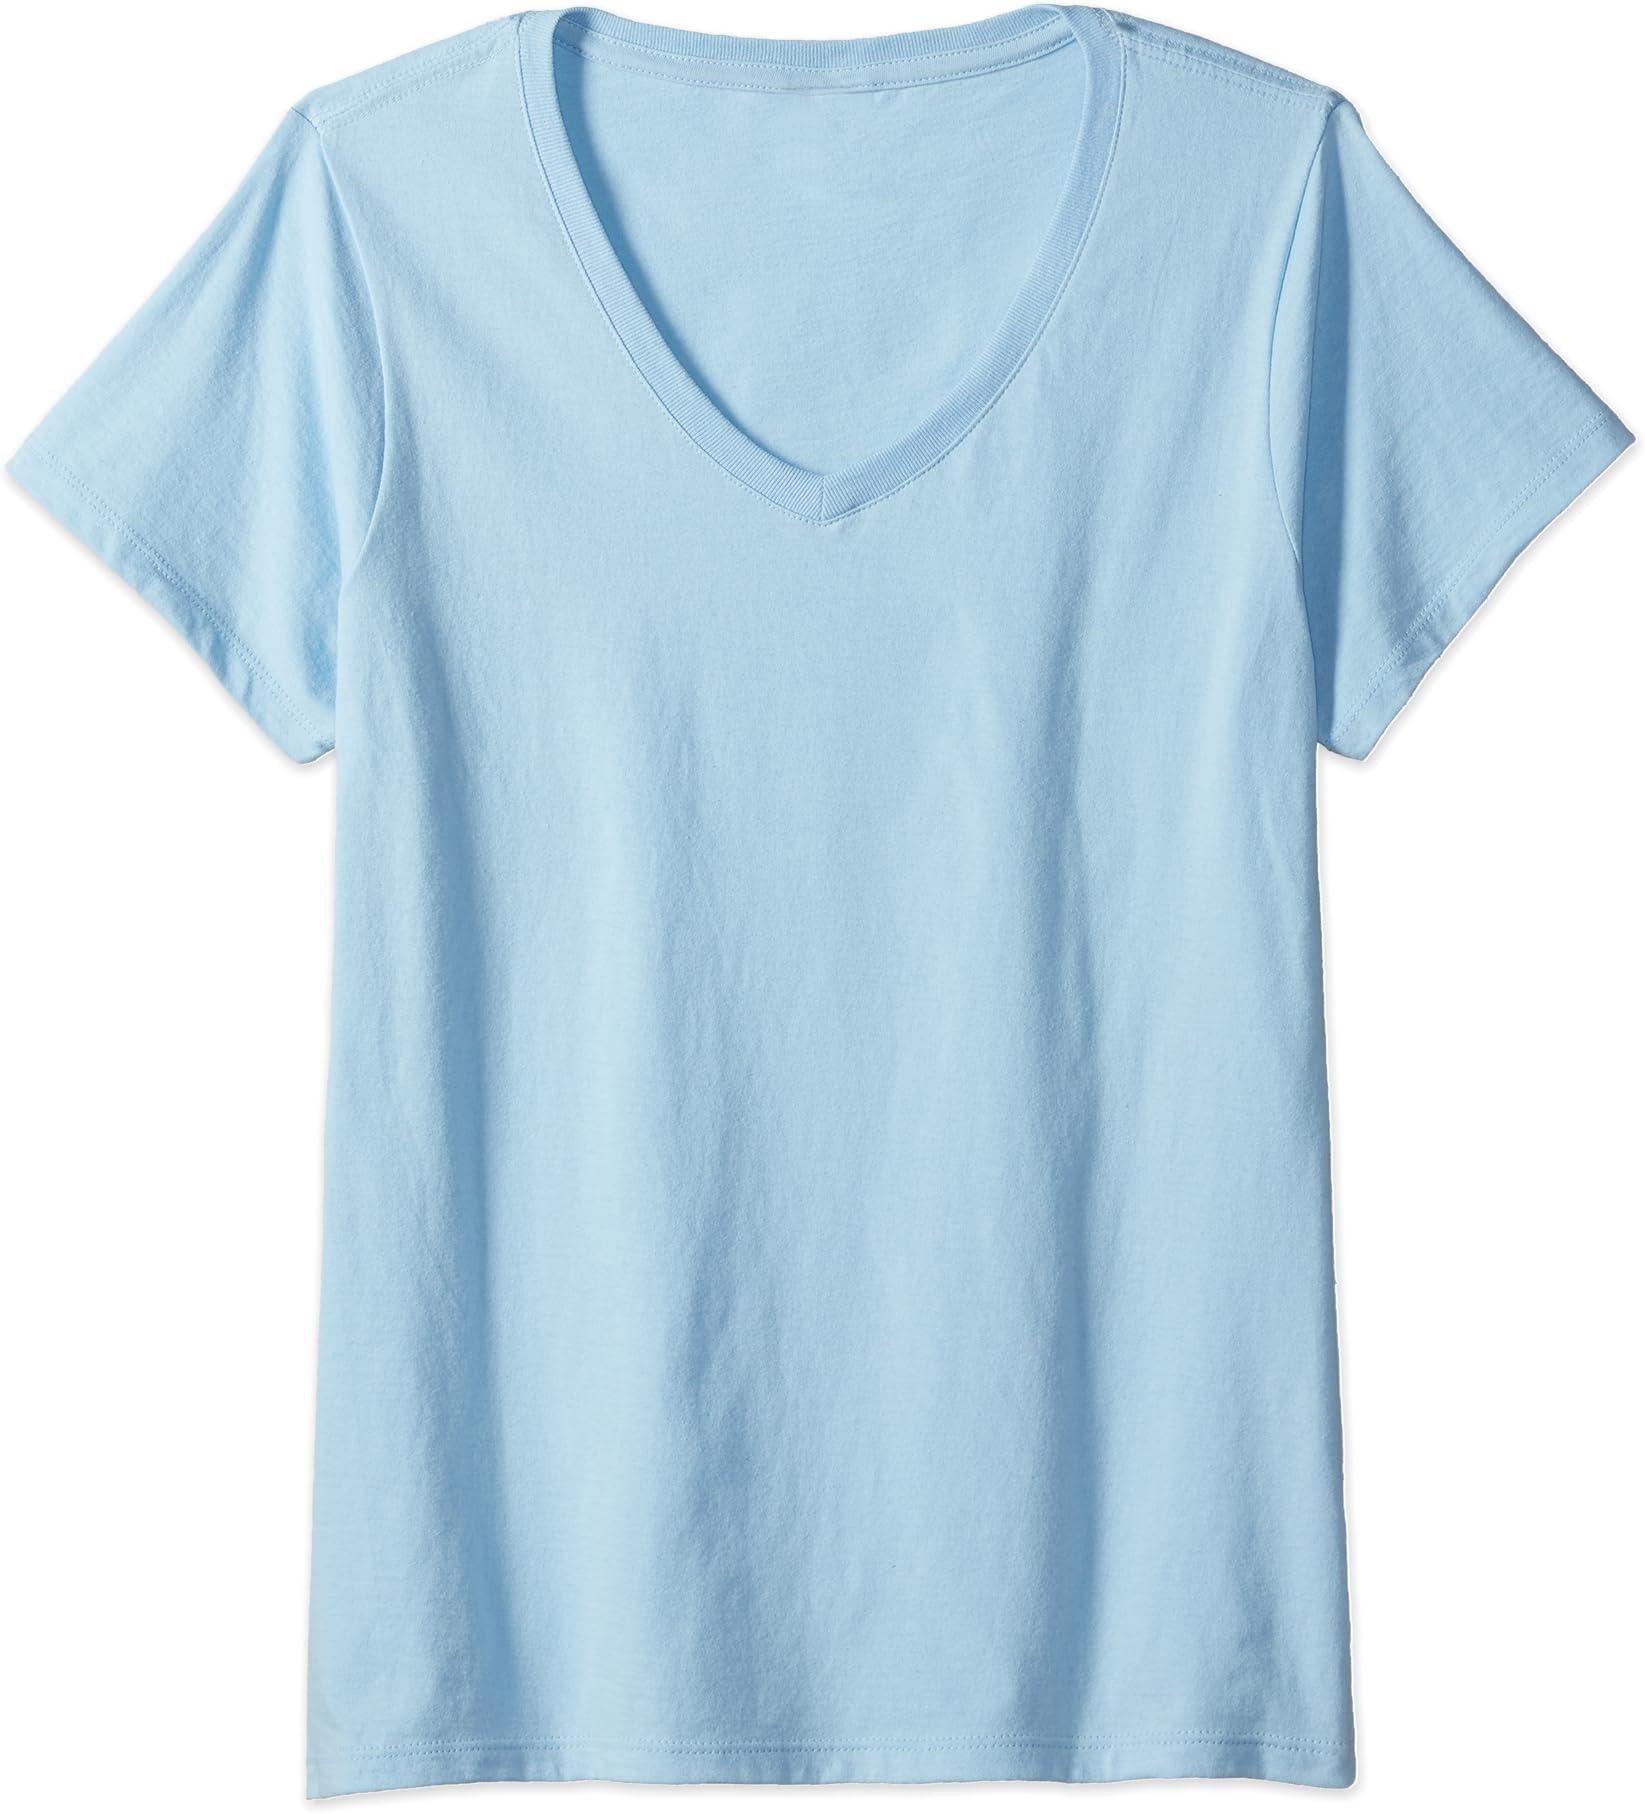 The Mountain Big Face Cheshire Cat Fantasie Damen T Shirt